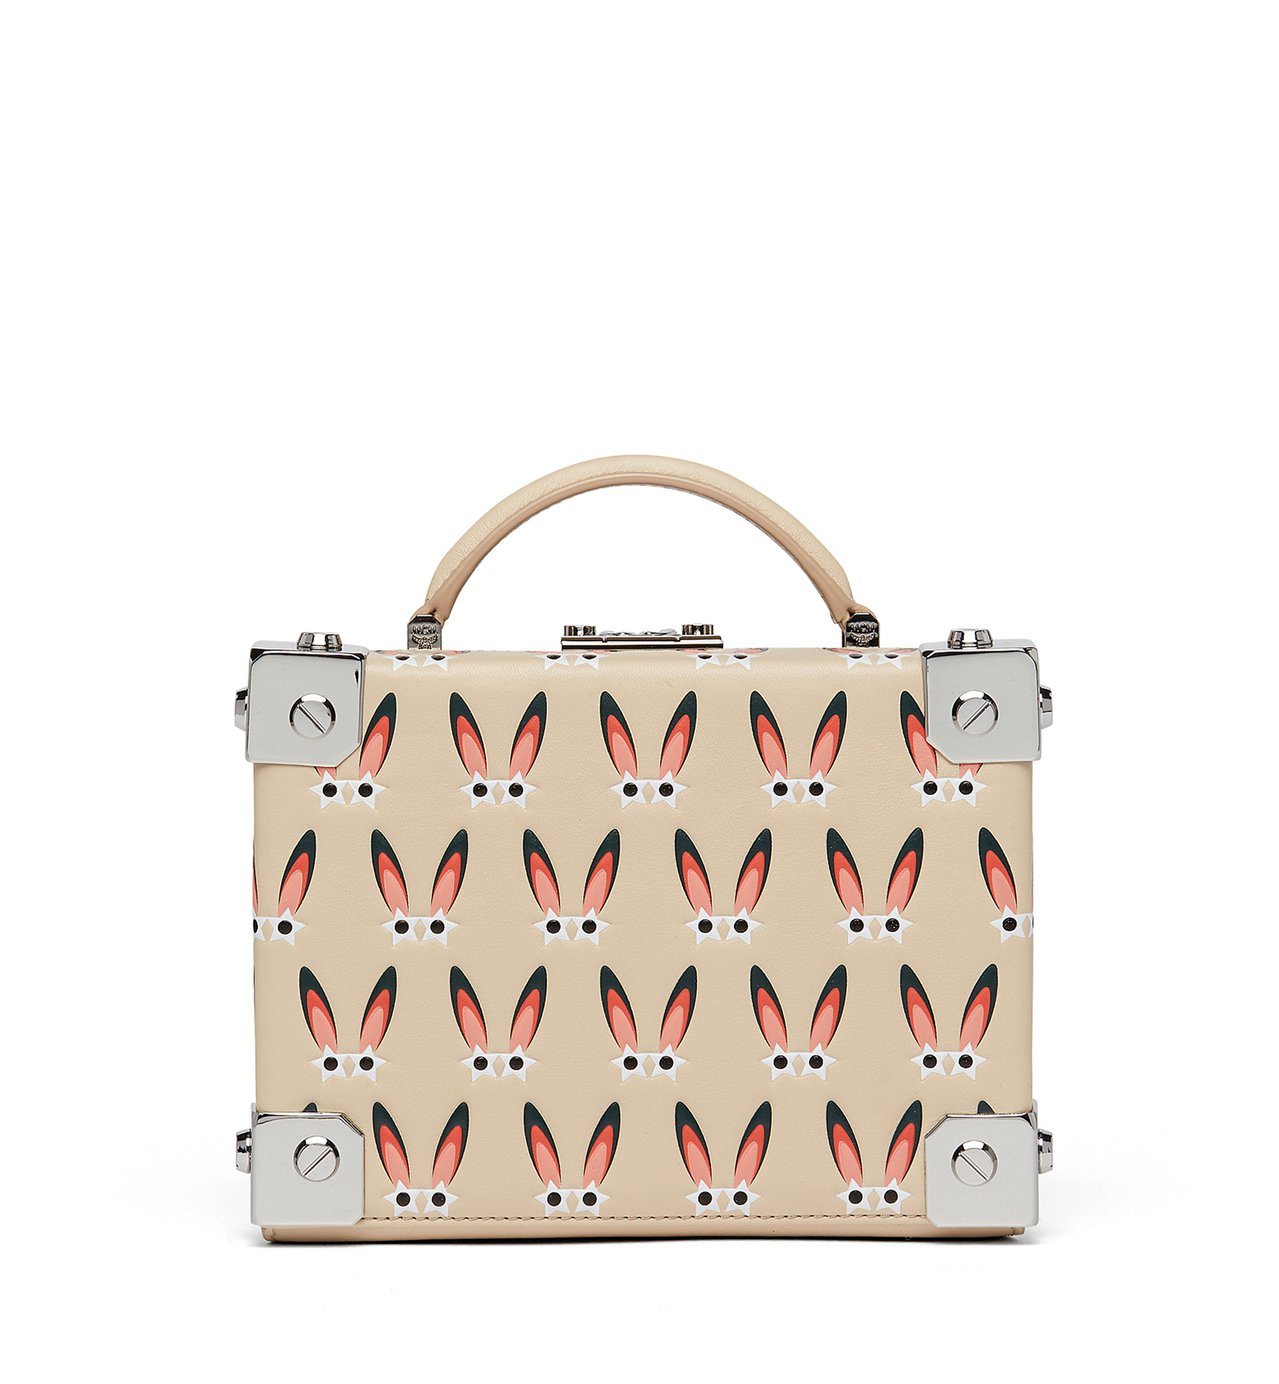 Berlin粉米色星型眼睛兔側背箱包,售價41,500元。圖/MCM提供